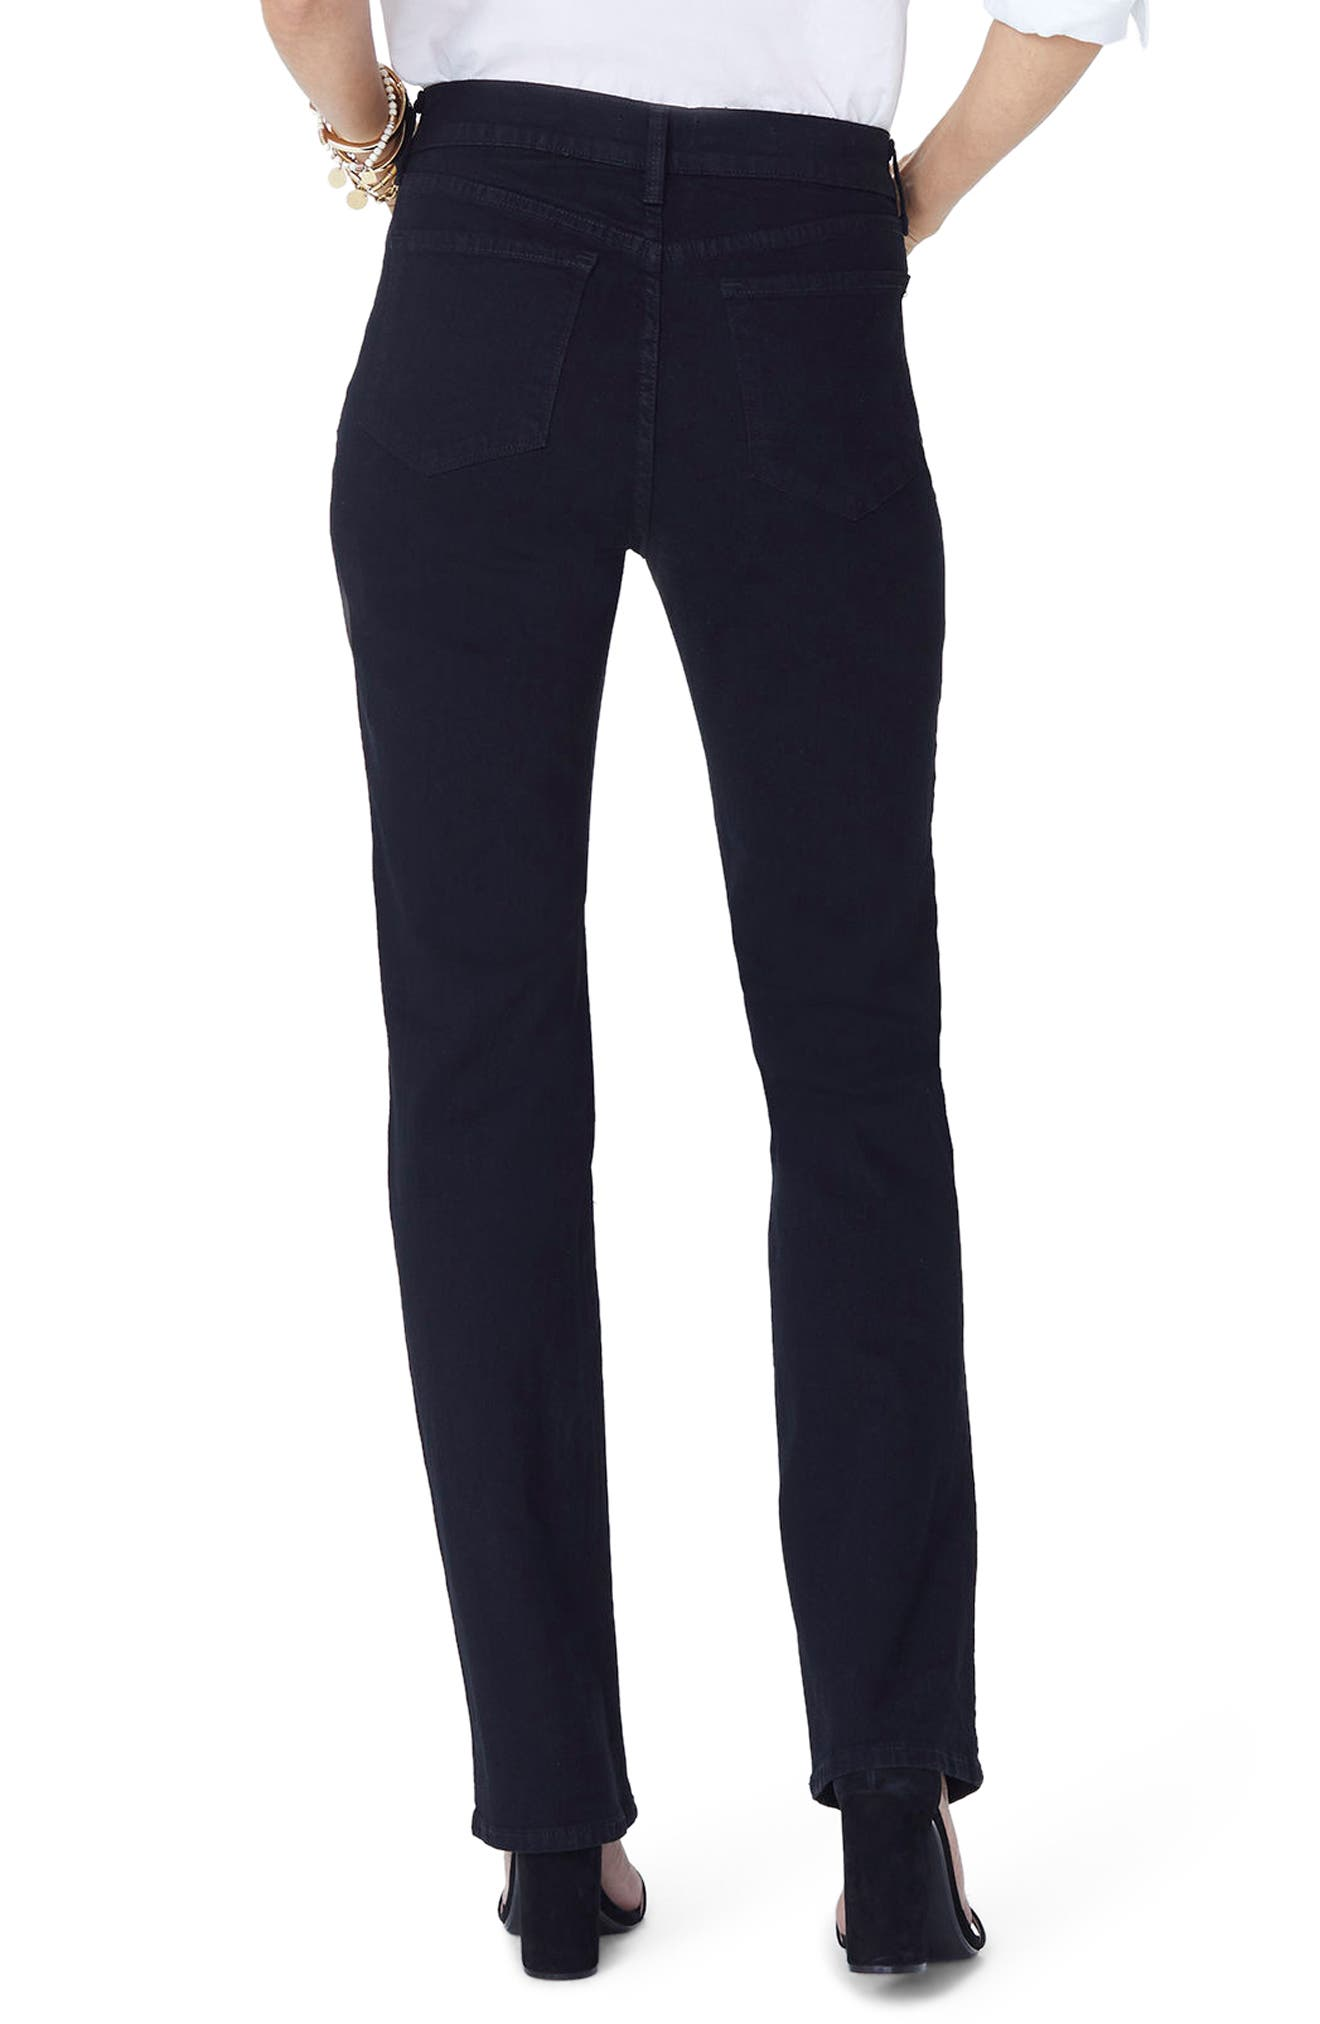 Marilyn Straight Jeans,                             Alternate thumbnail 2, color,                             Black